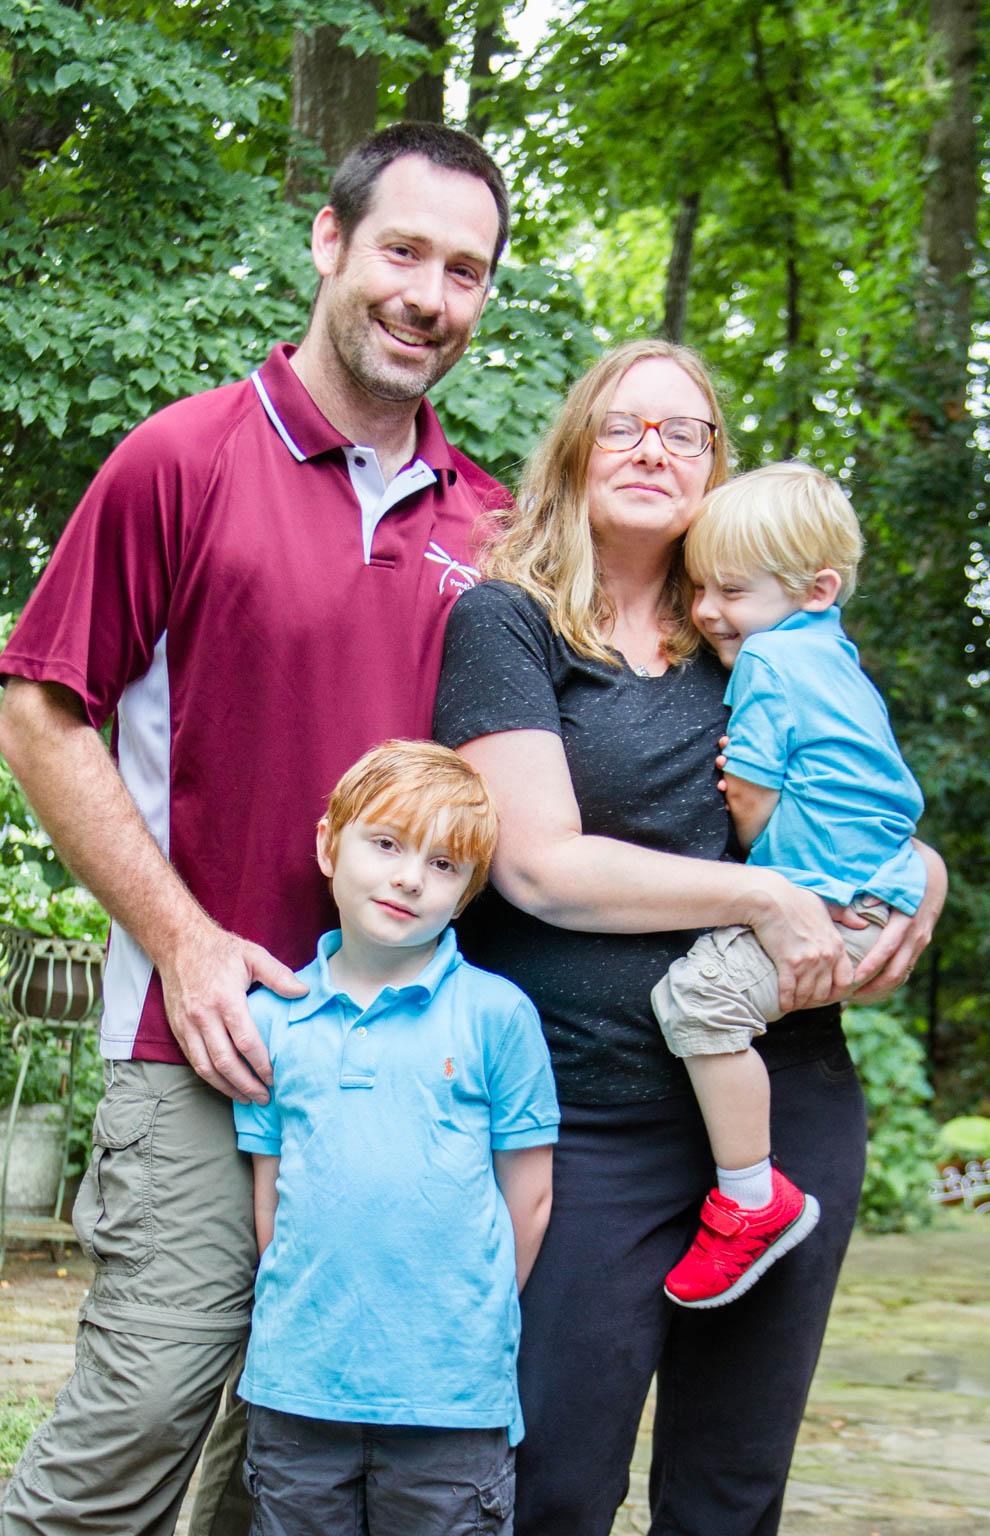 lakehartwellfamilyportraits-24.jpg